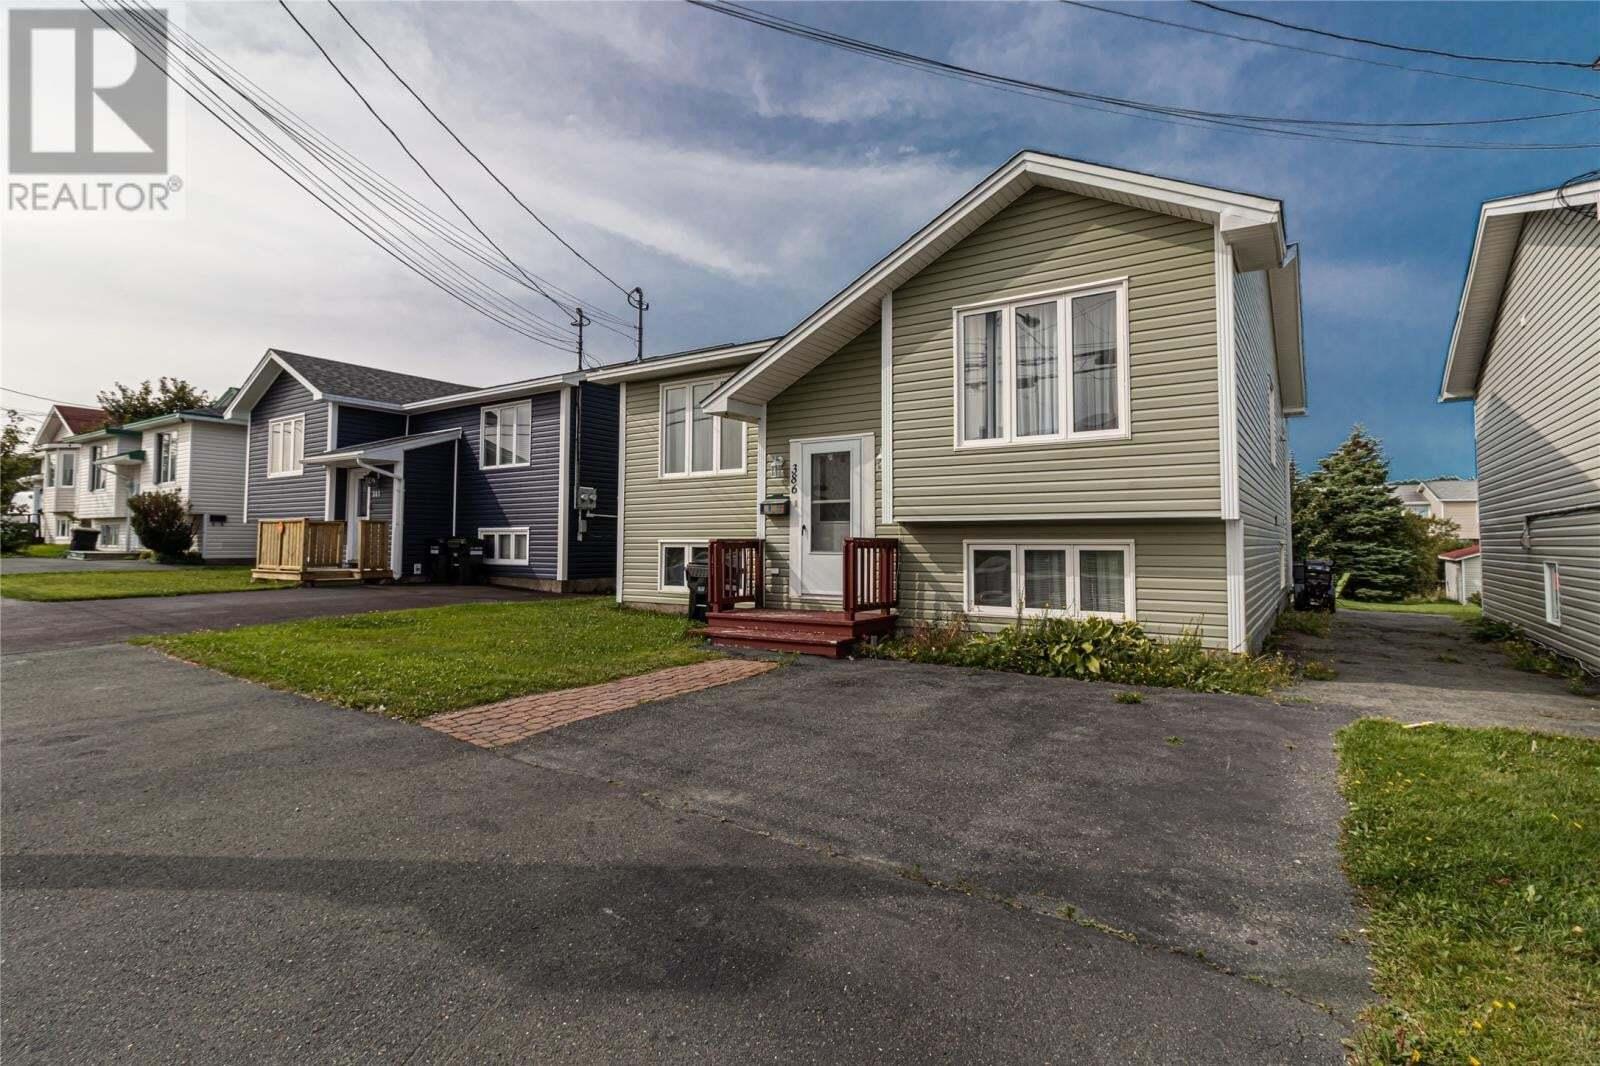 House for sale at 386 Blackmarsh Rd St. John's Newfoundland - MLS: 1221357